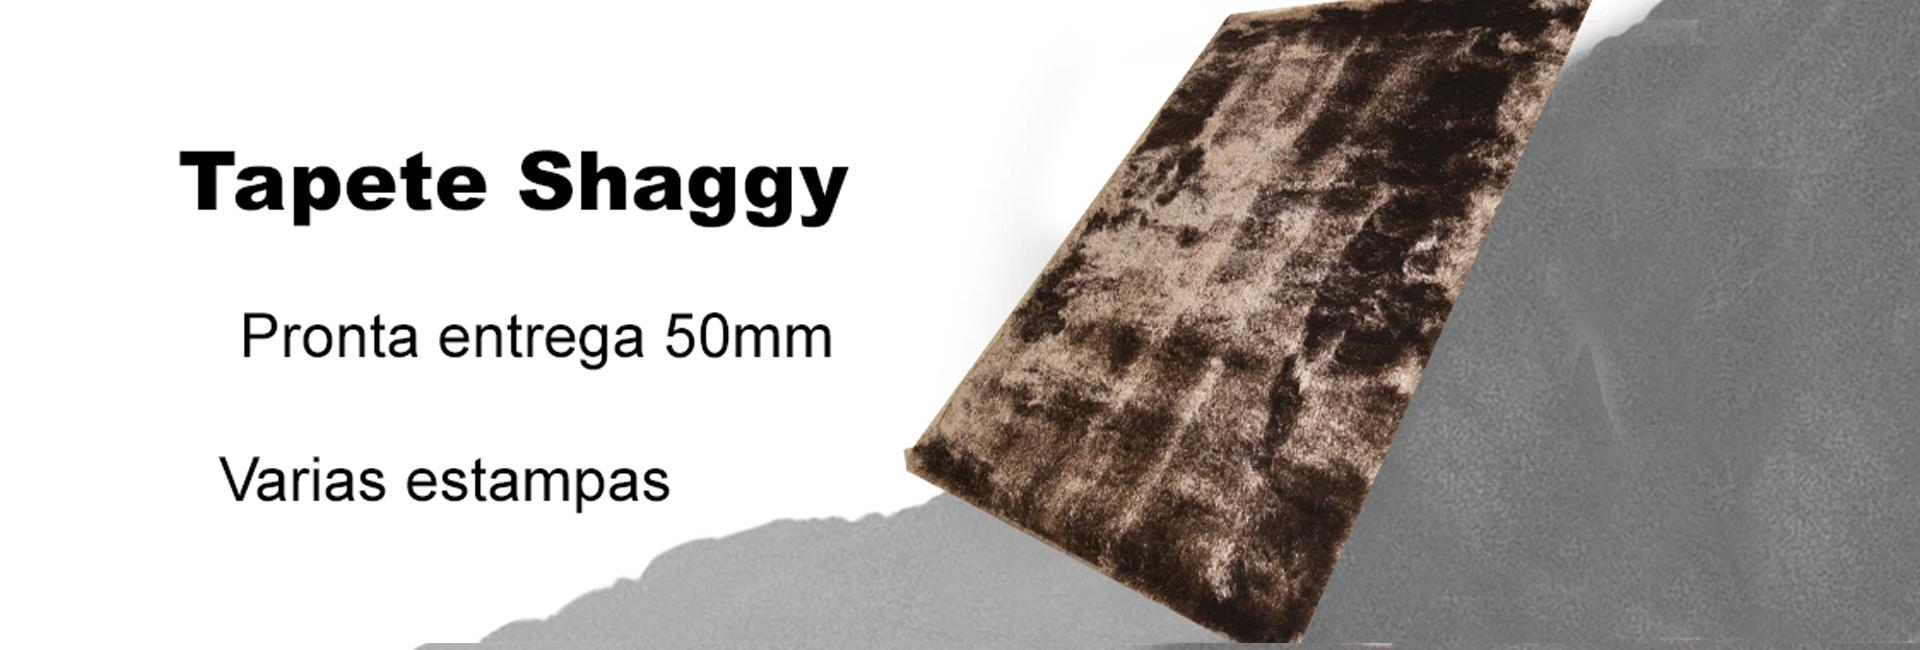 tapete shaggy peludo